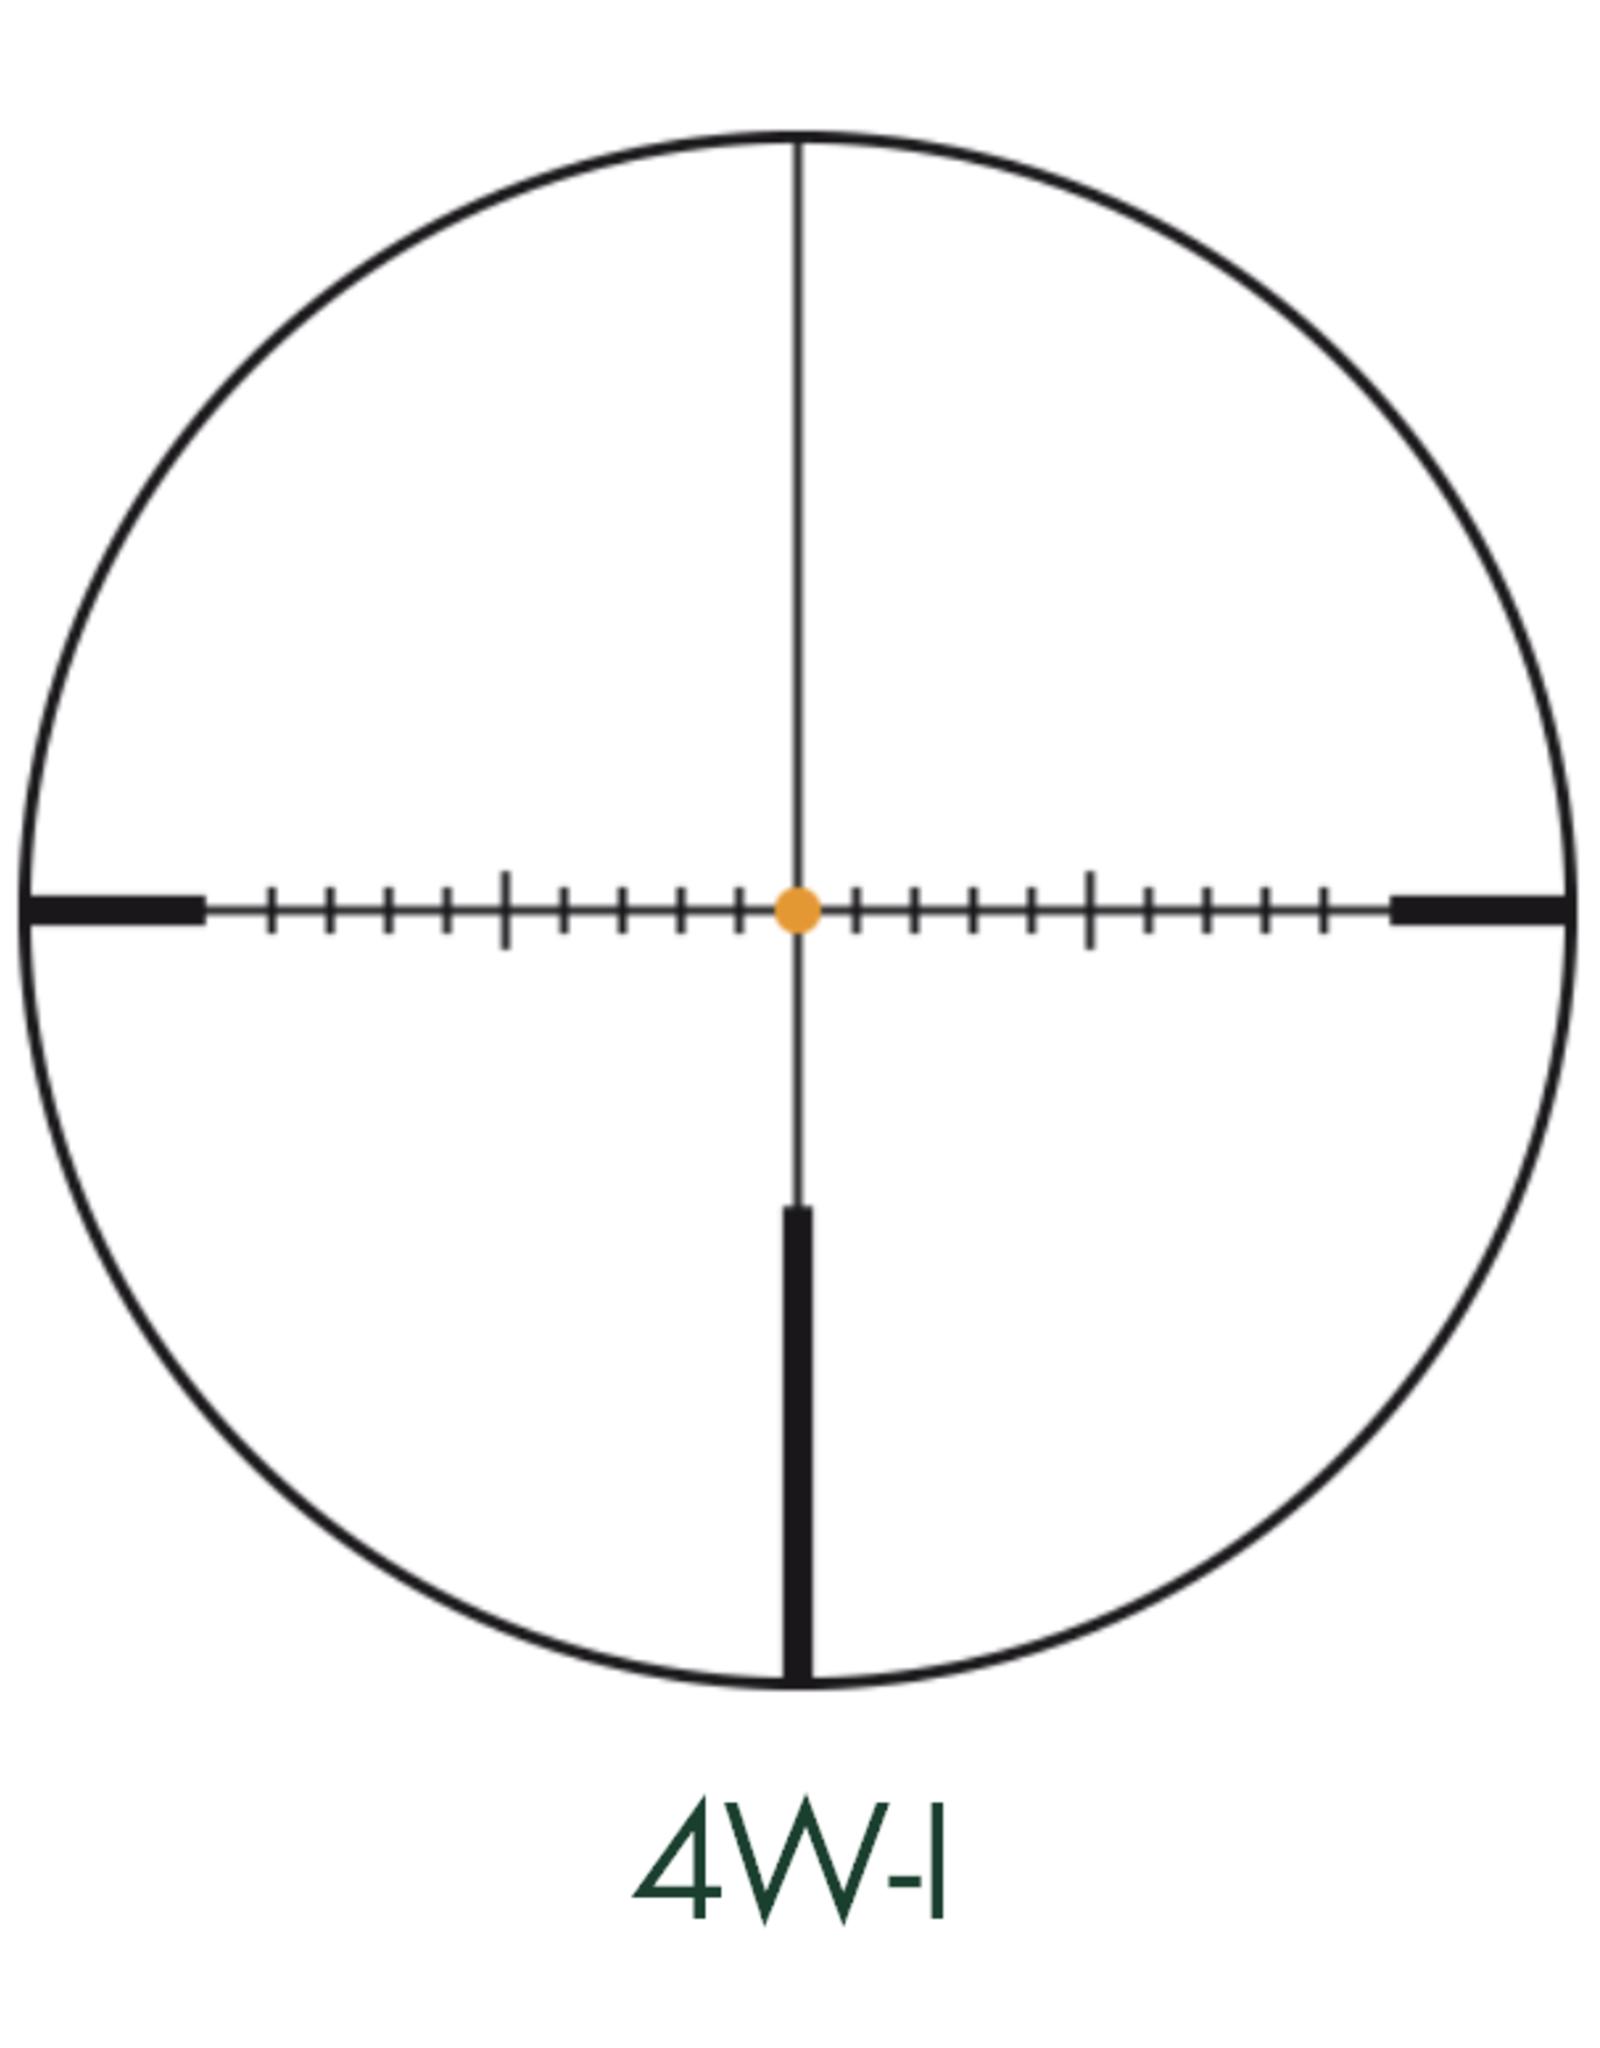 Swarovski Optik Swarovski Z8i 3.5-28x50 4W-I